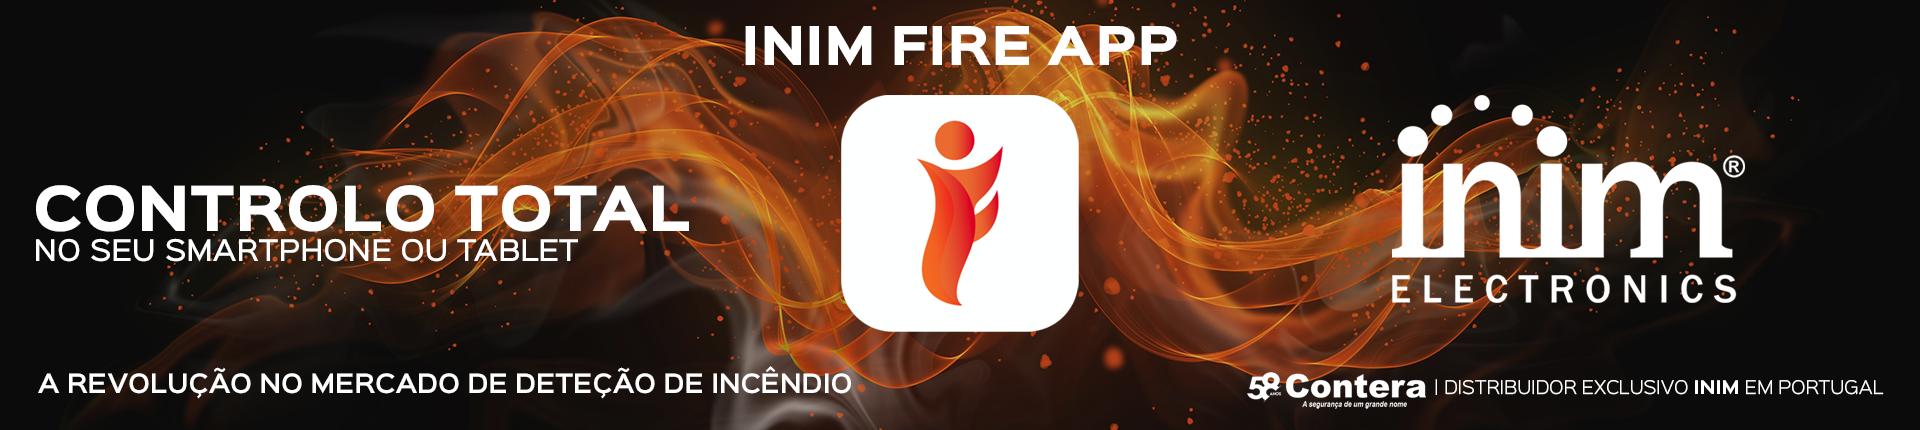 https://bo.contera.pt/fileuploads/Banners/BannersgrandesHomepage/Slide-INIM-FIRE-PT-2.png